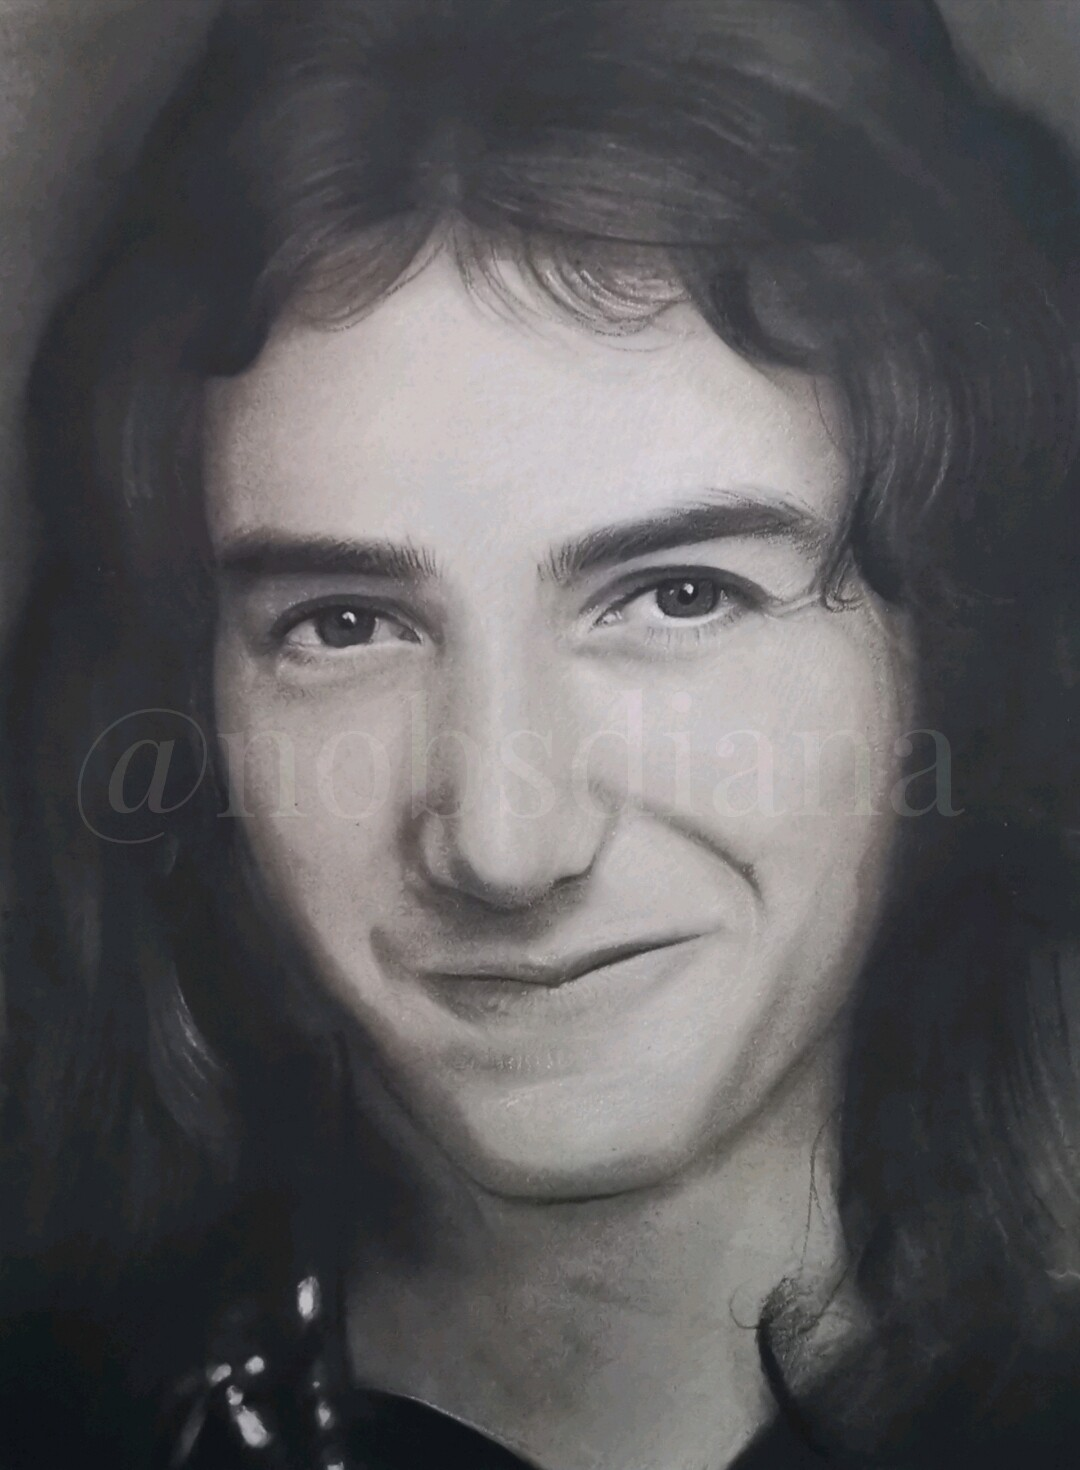 The portrait of John Deacon /Limited edition print